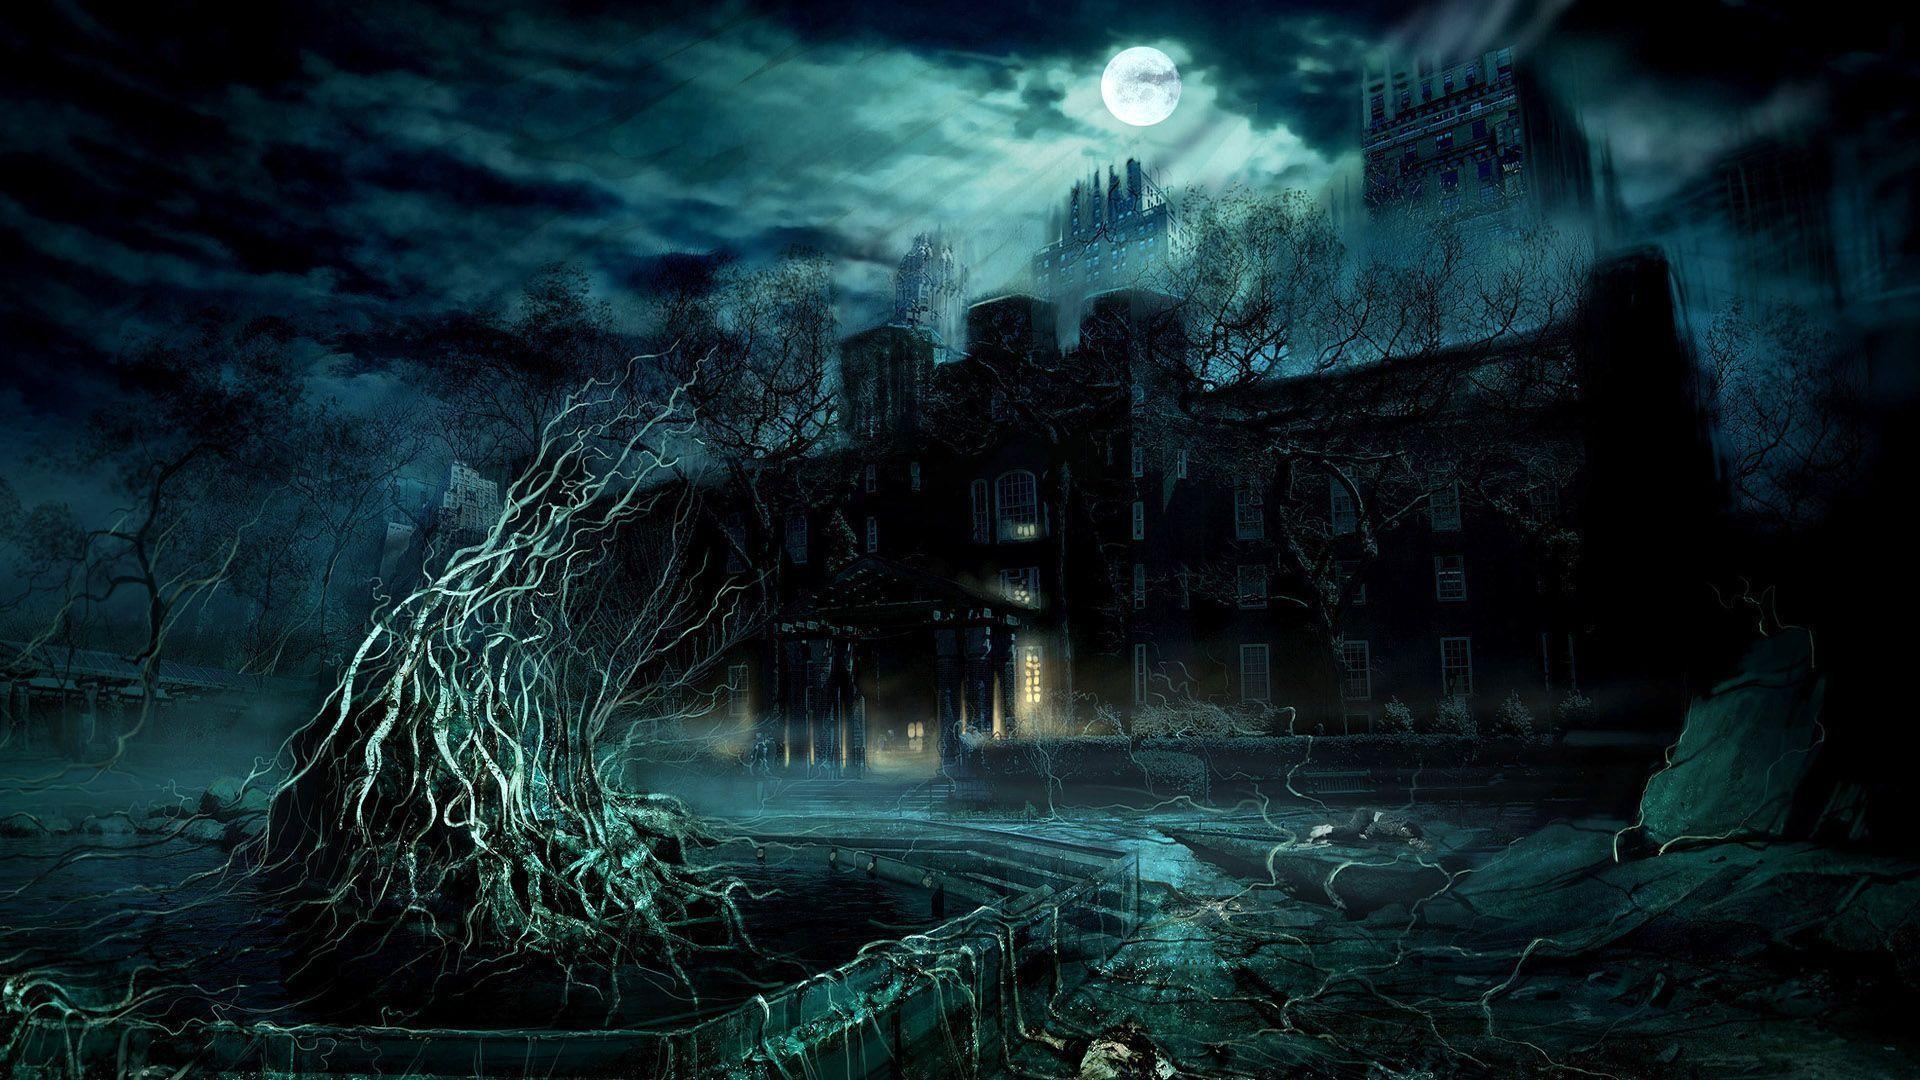 Download Scary Dark Castle Wallpaper   Free Wallpapers